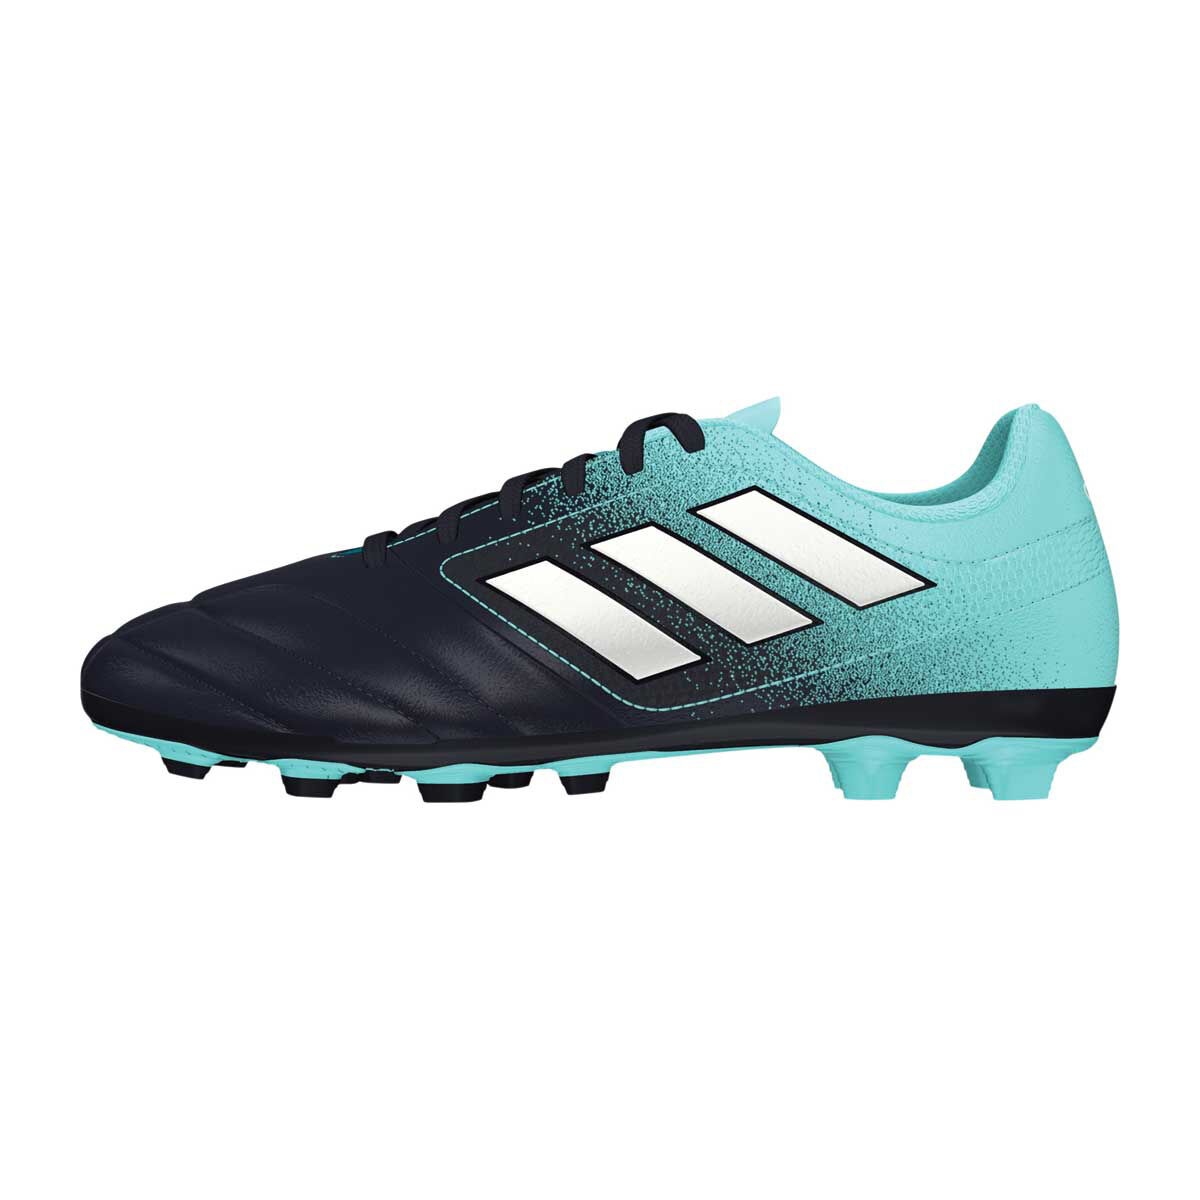 pretty nice eb491 b4d7f ... store adidas ace 17.4 fxg junior football boots white aqua us 11 junior  white dcc11 00365